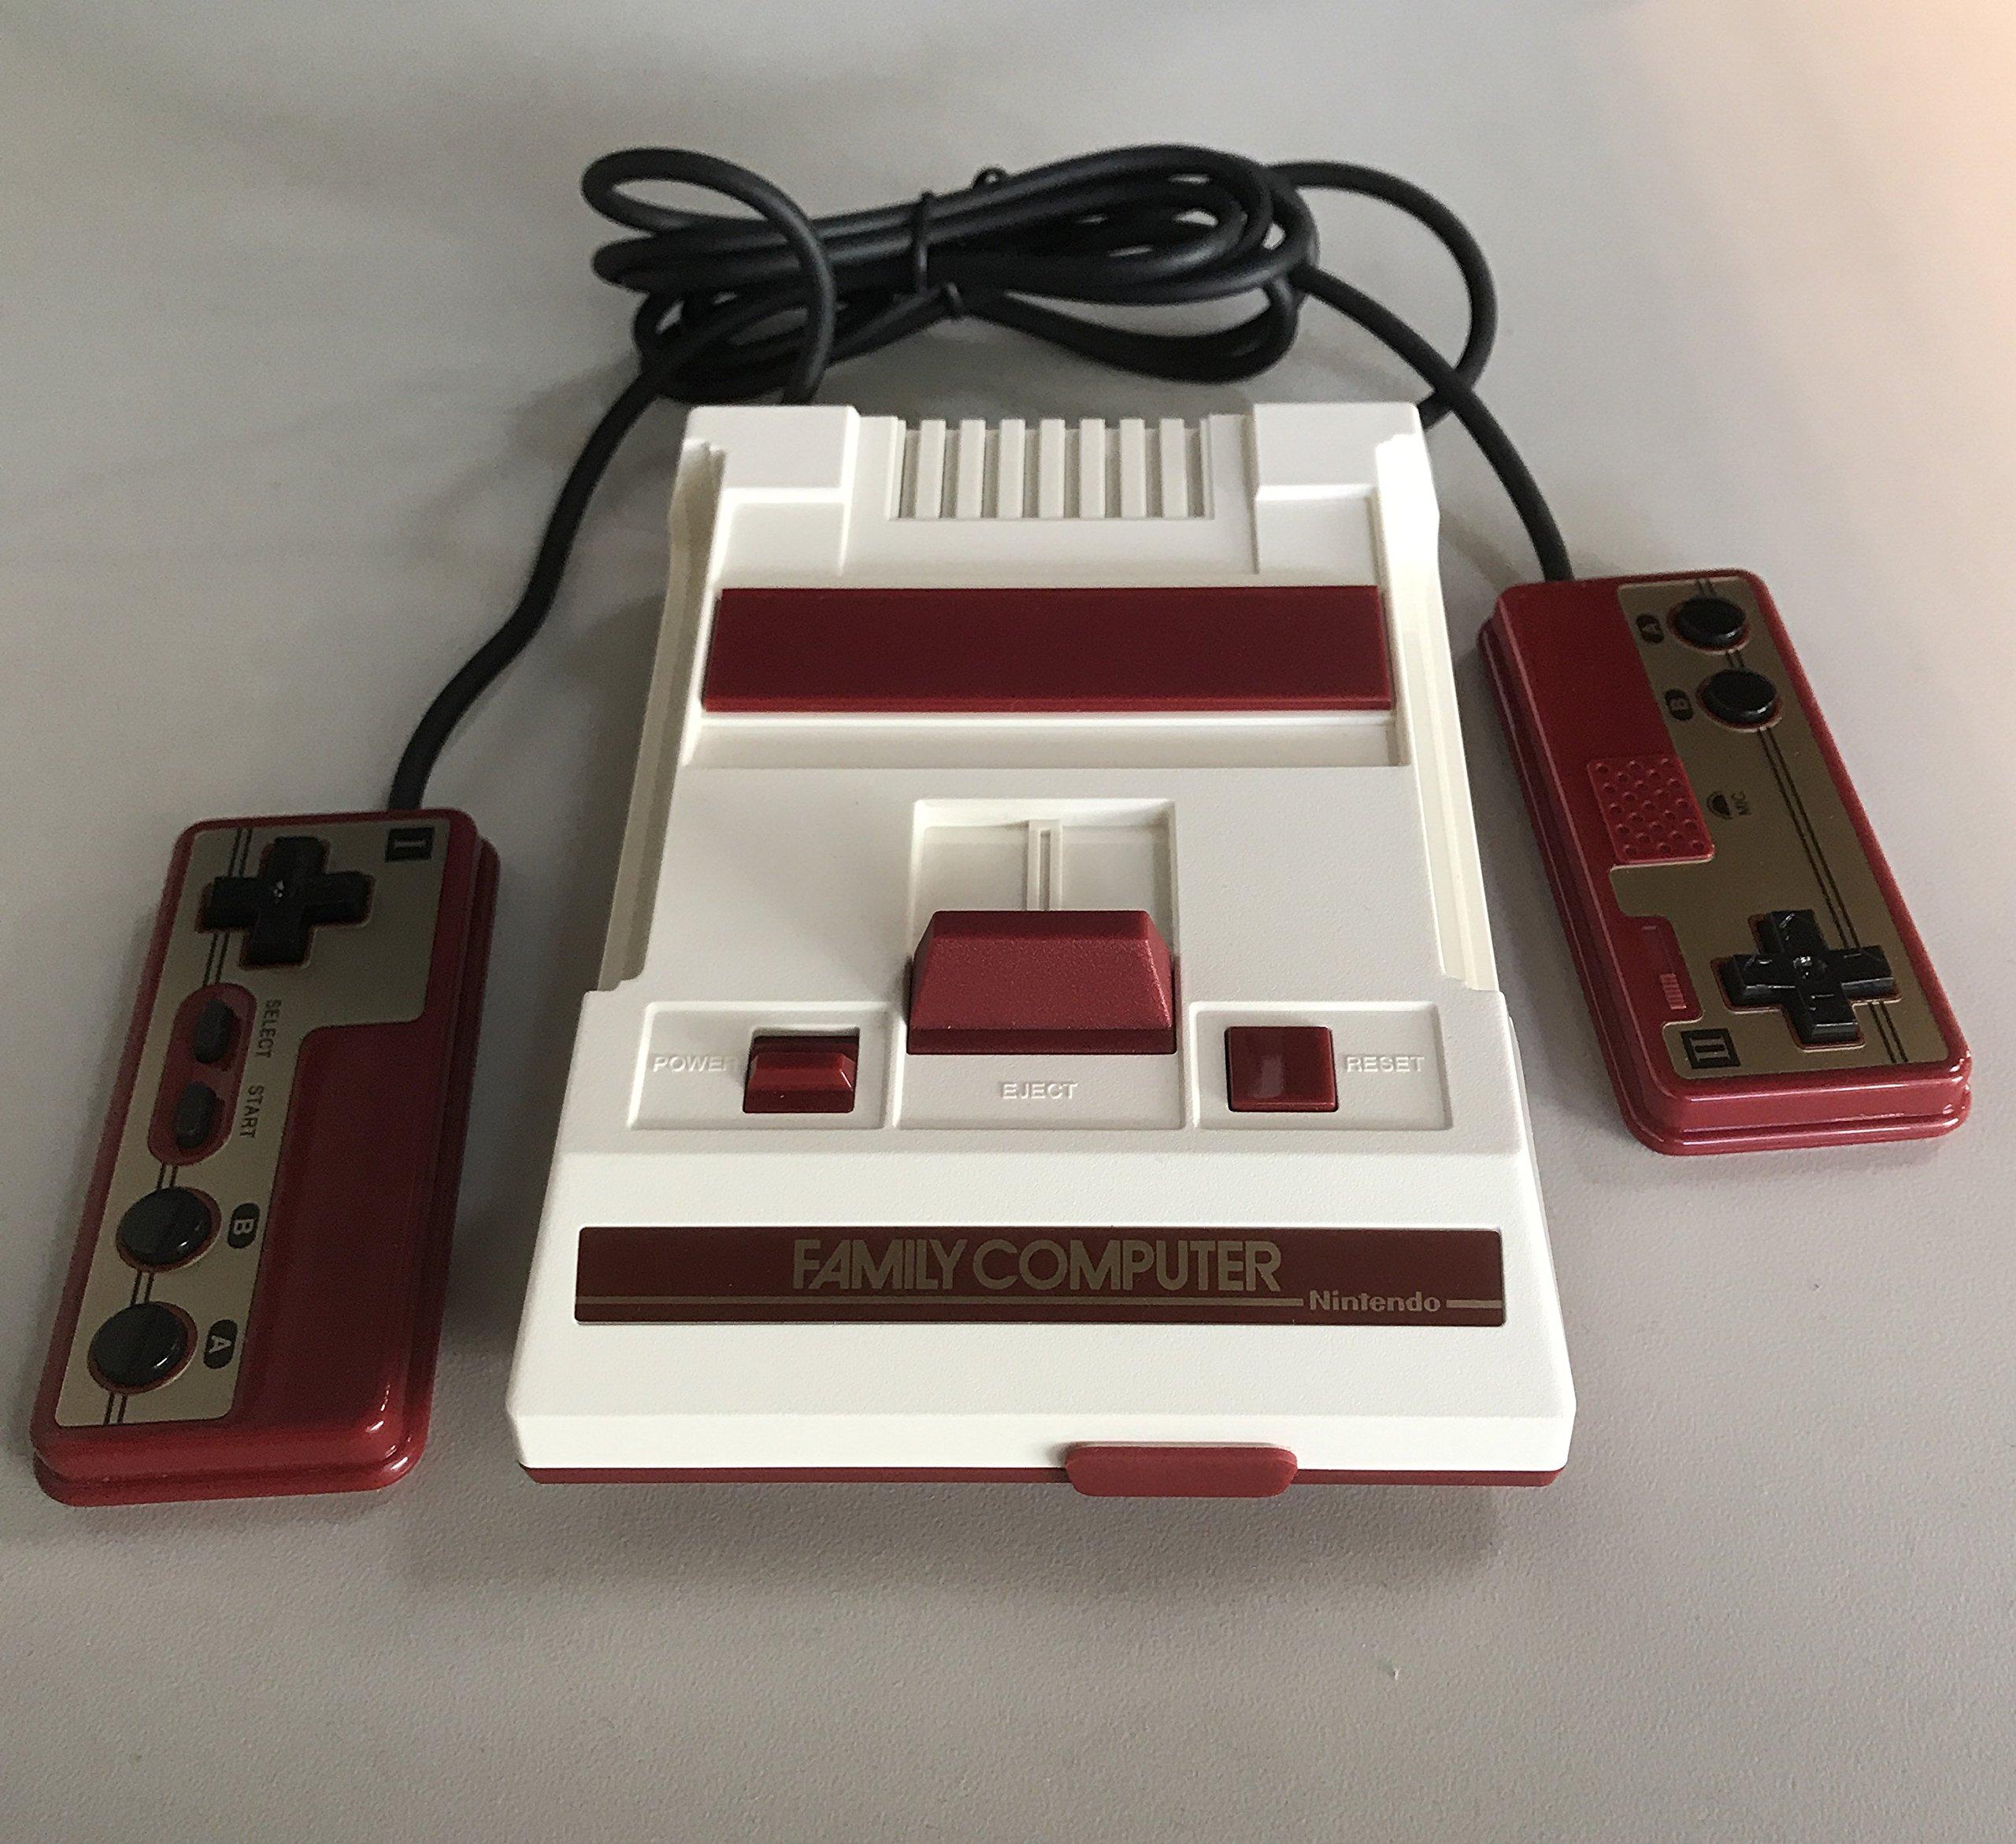 Nintendo classic mini family computer(Japan Import) by Nintendo (Image #2)